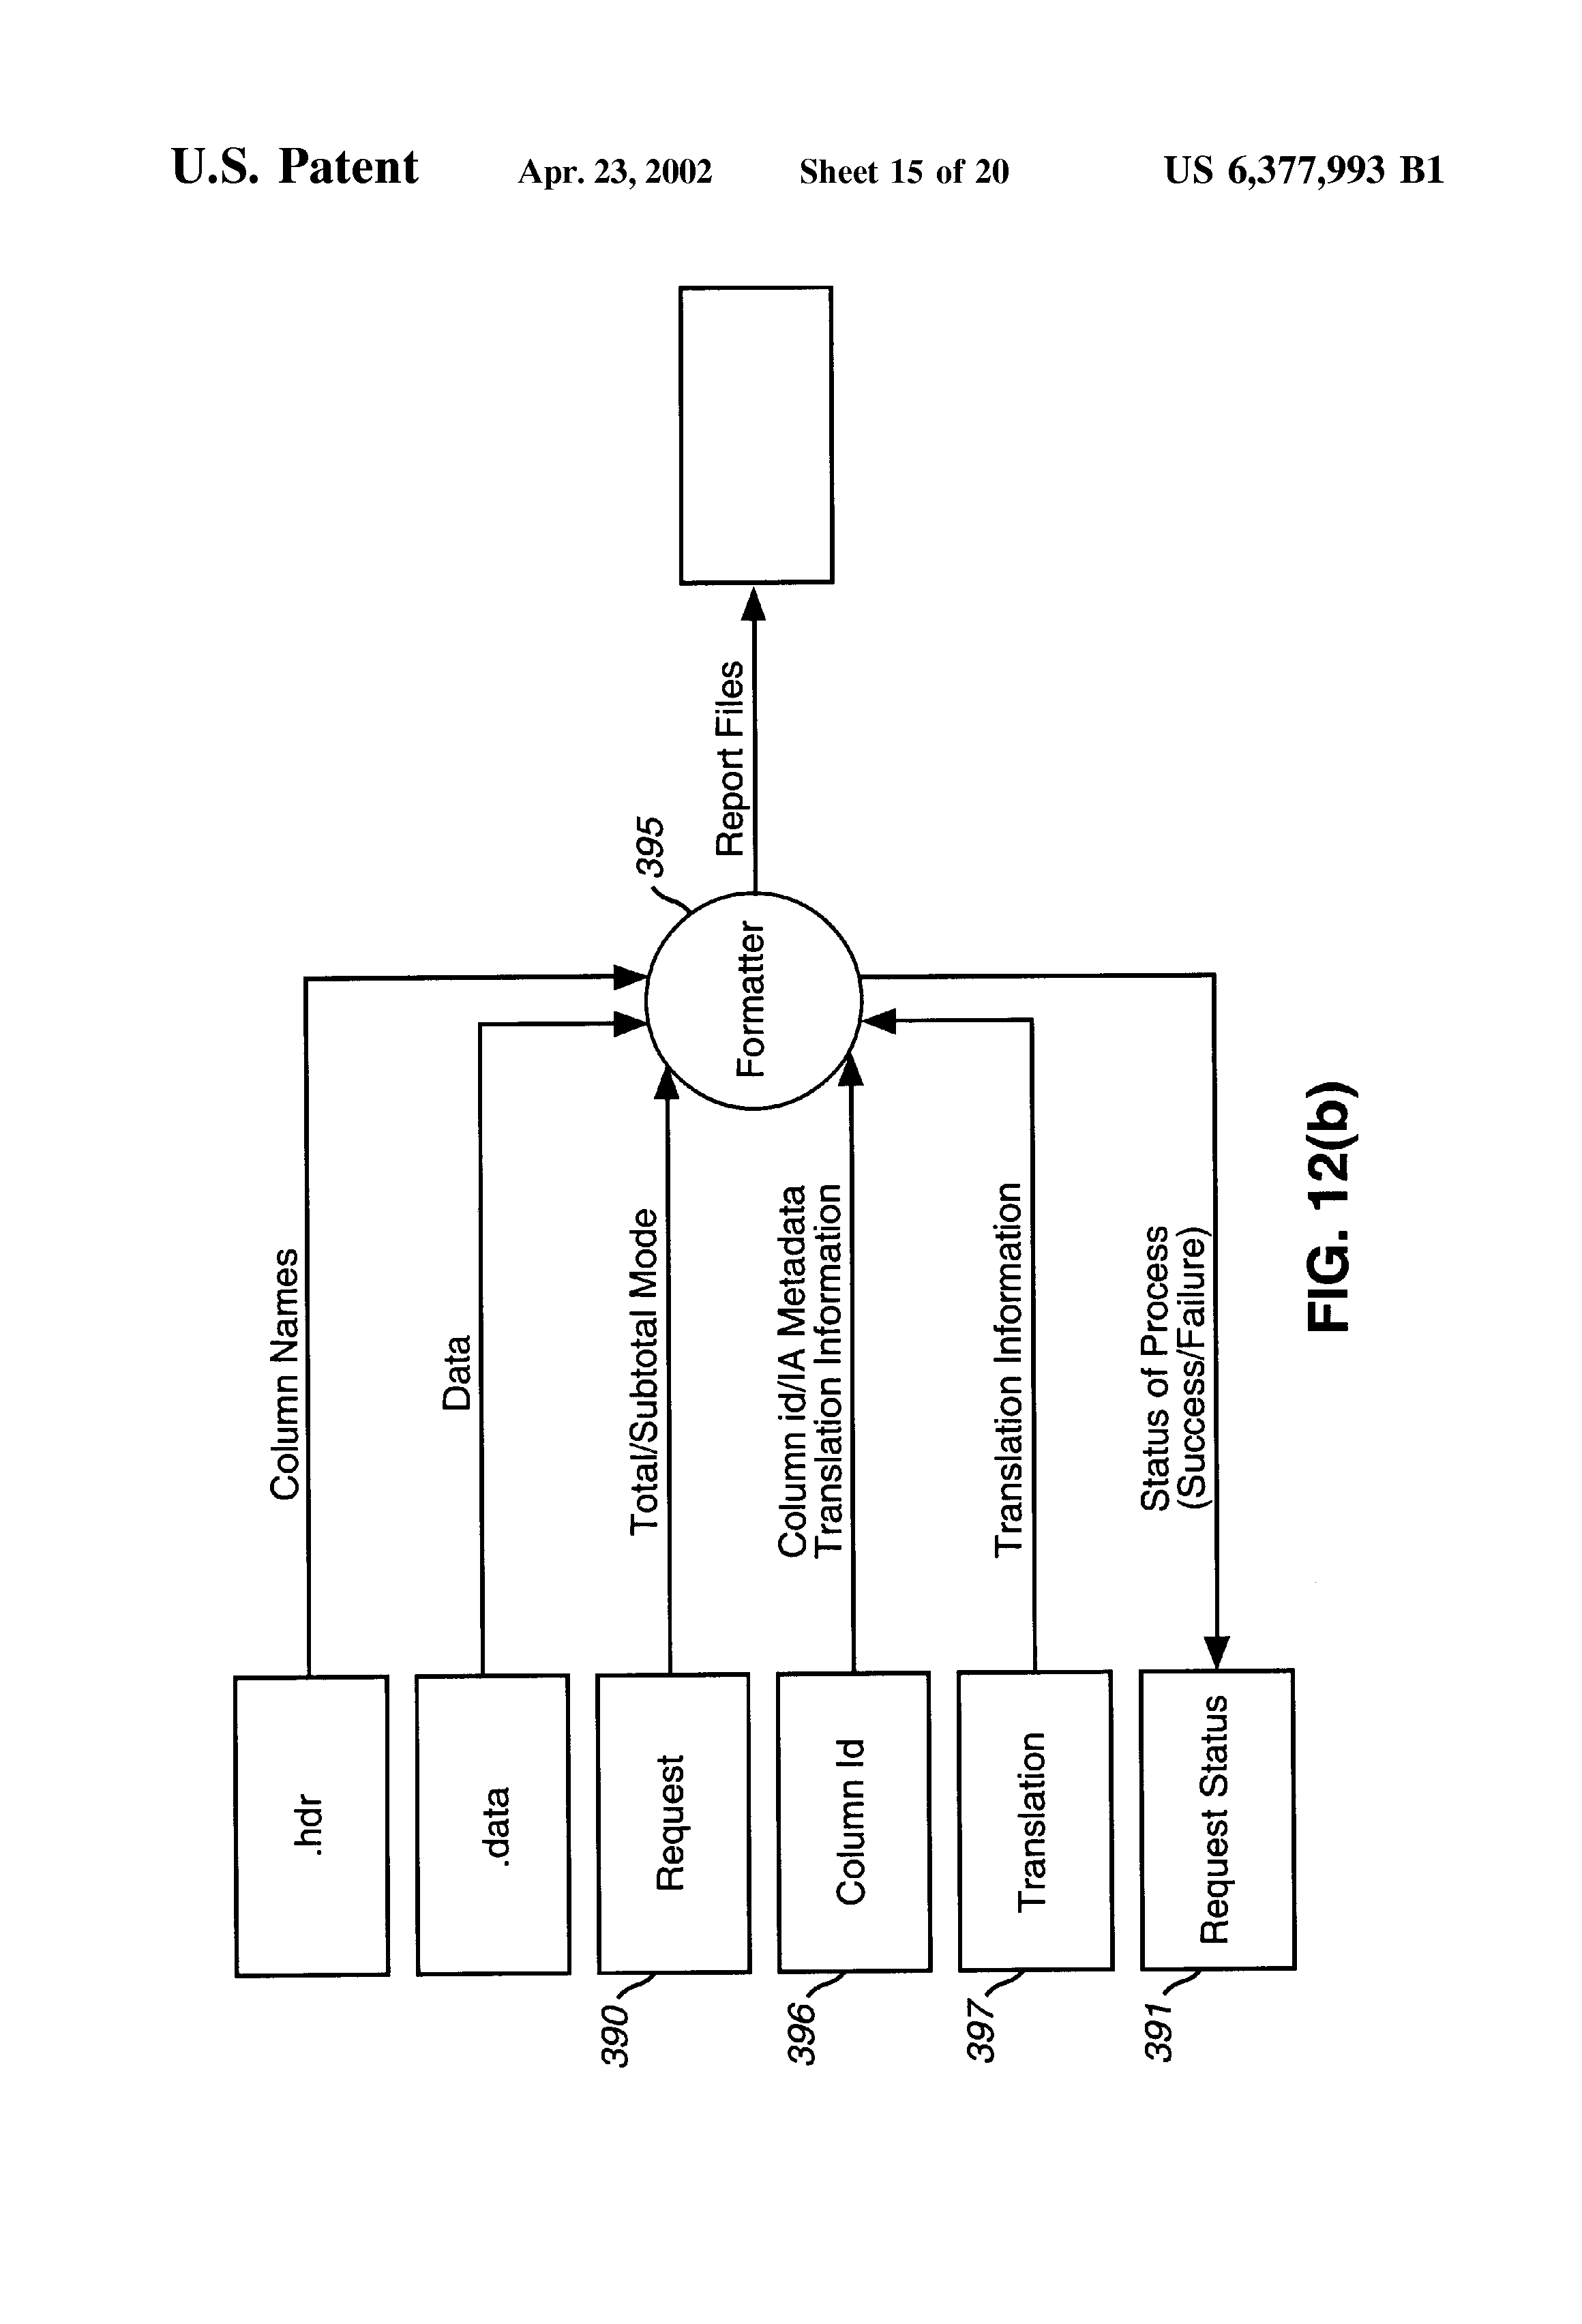 Dsc Alarm Panel Wiring Diagrams Moreover 2004 Ford Explorer Fuel Pump